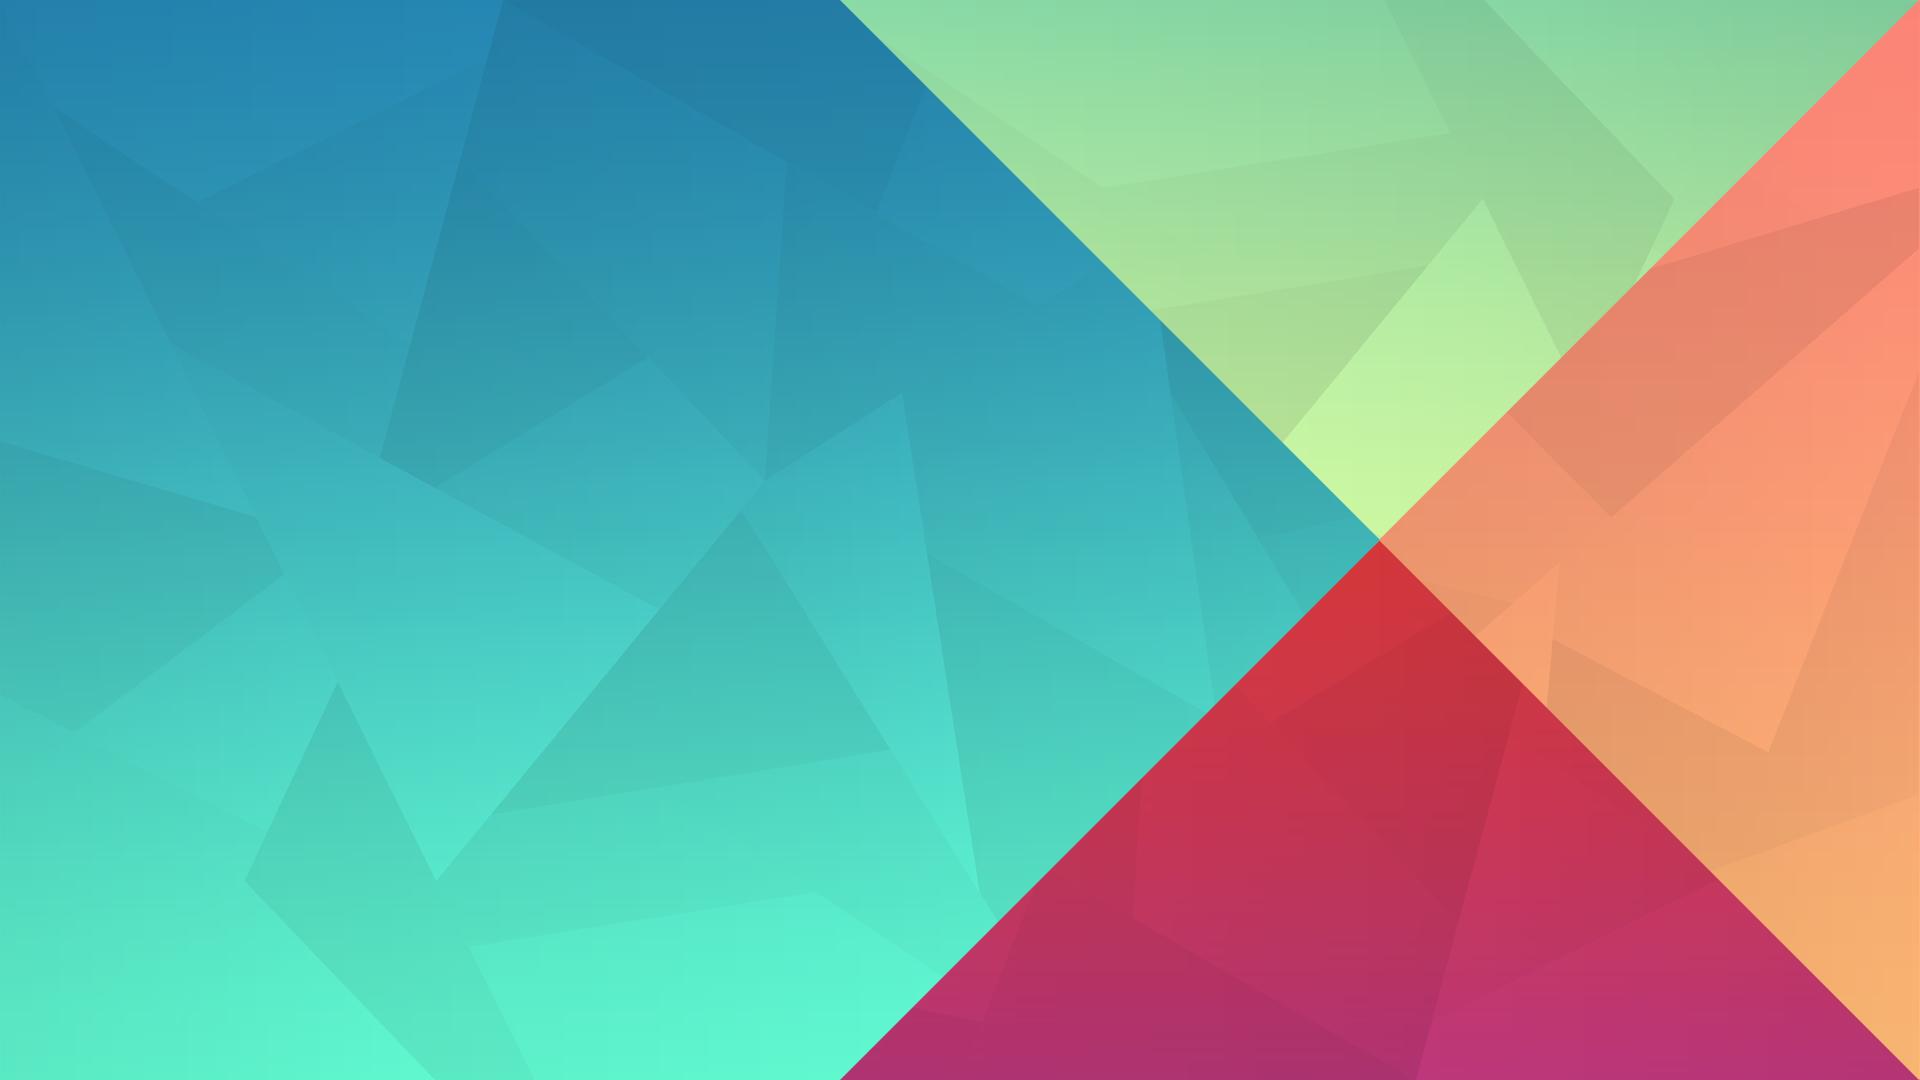 Google themes free - Theme Bin Blog Archive Google Abstract Hd Wallpaper